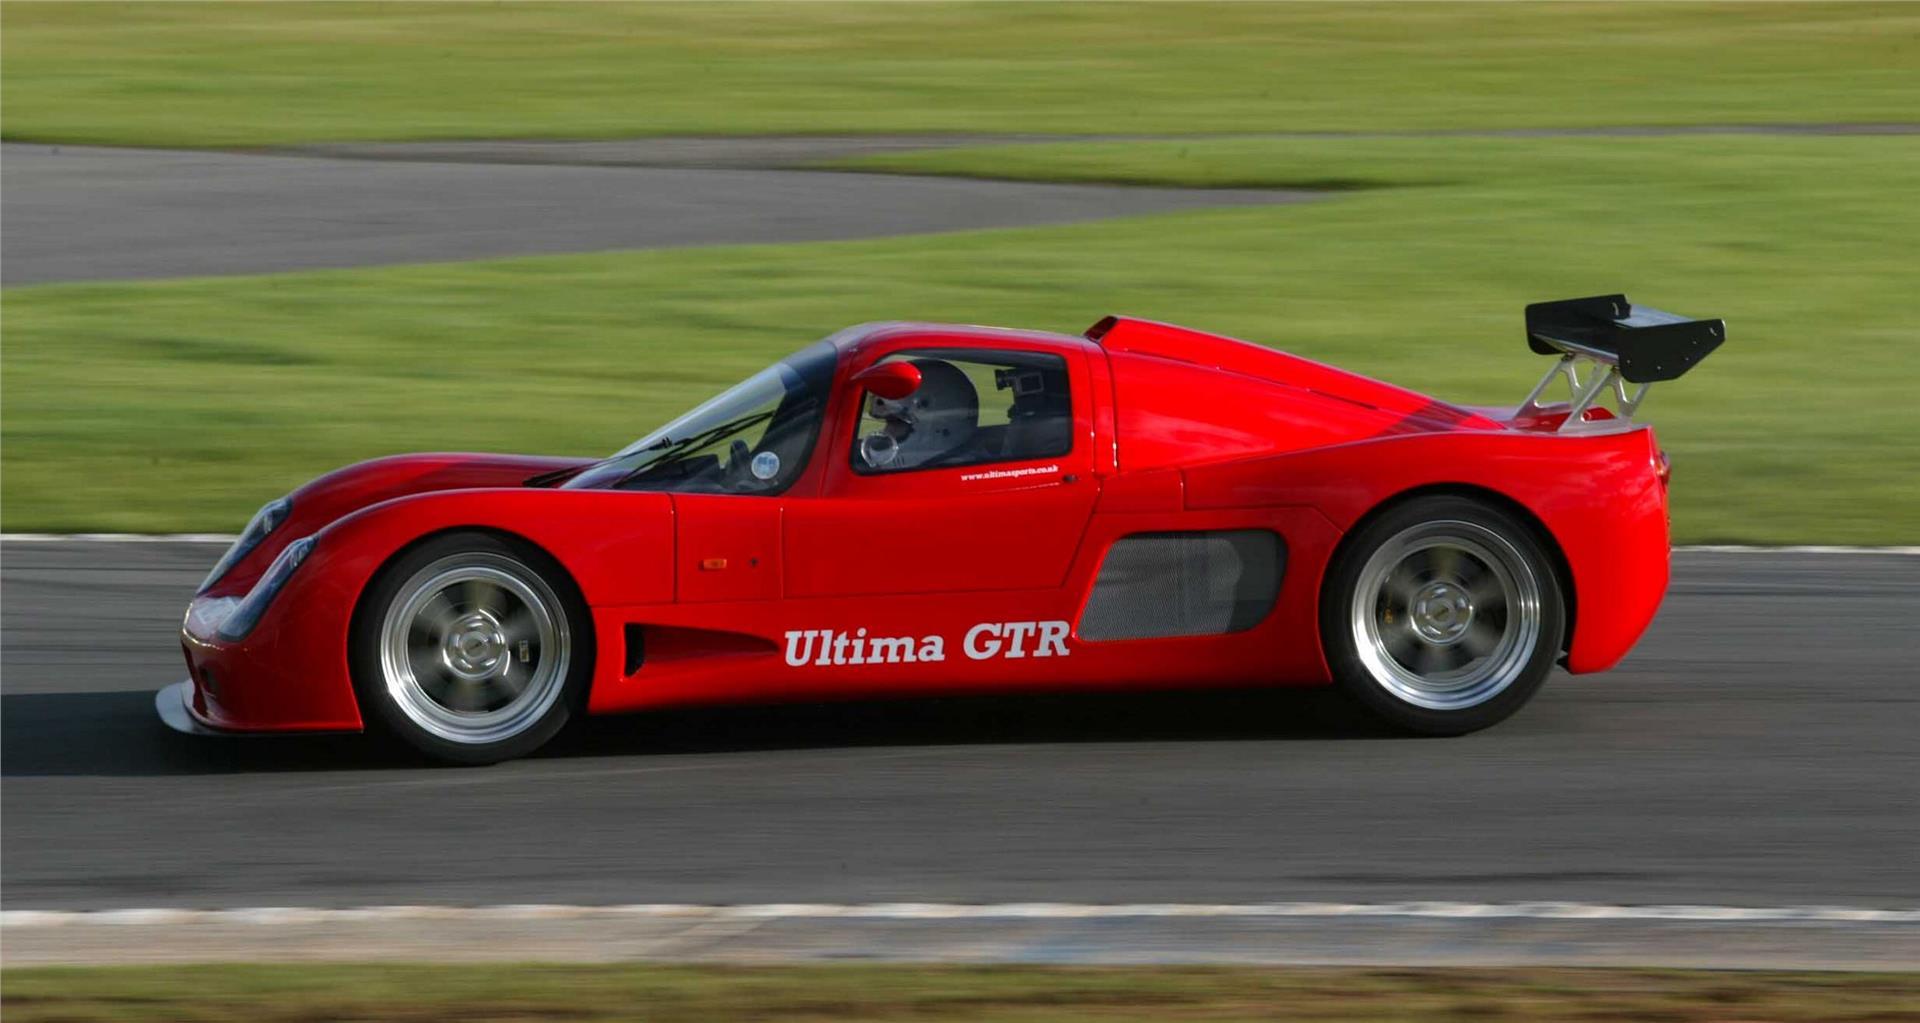 Ultima GTR Skidpan